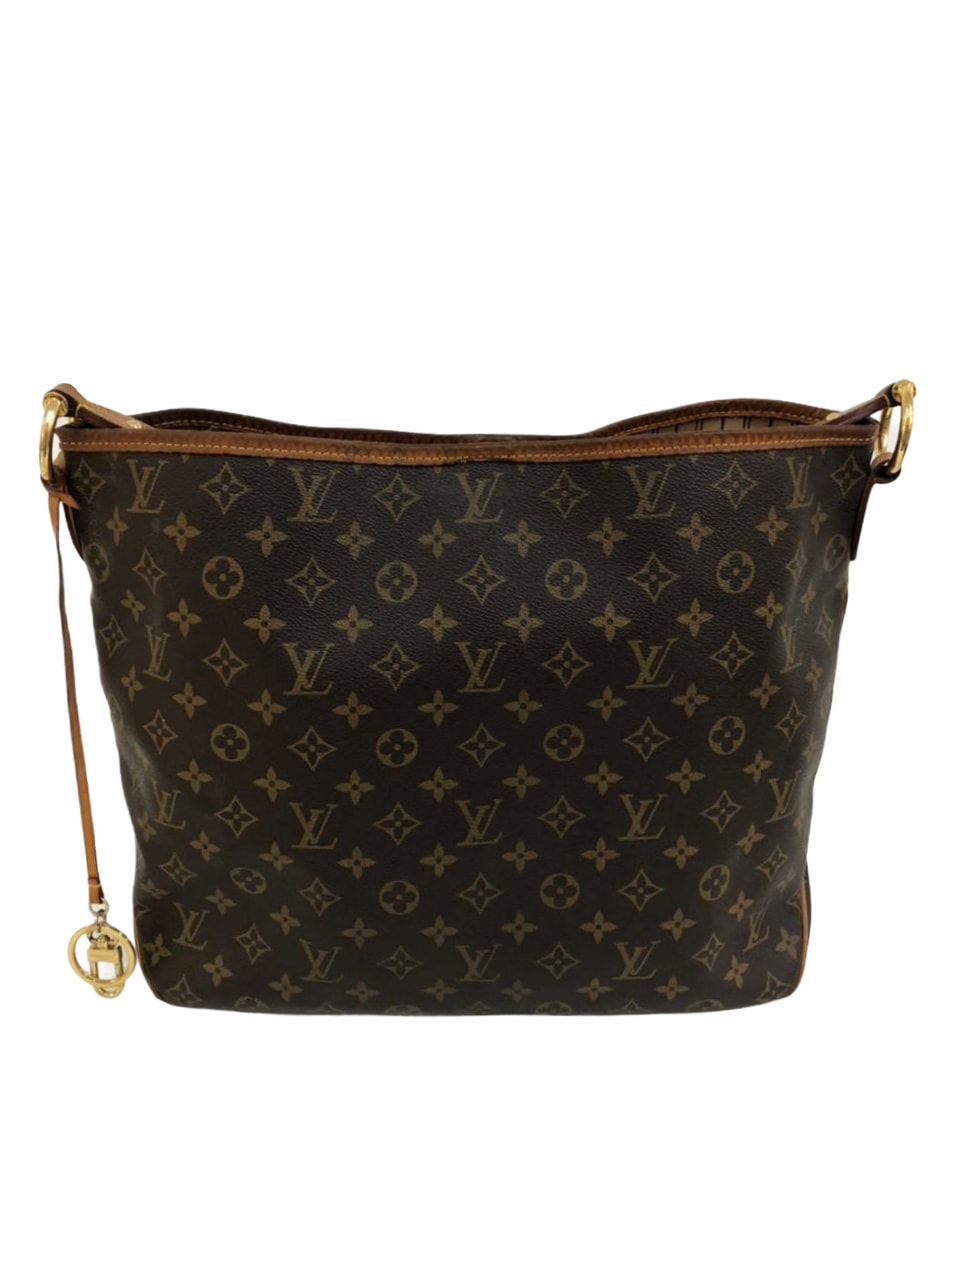 Bolsa Louis Vuitton Delightful Monogram MM